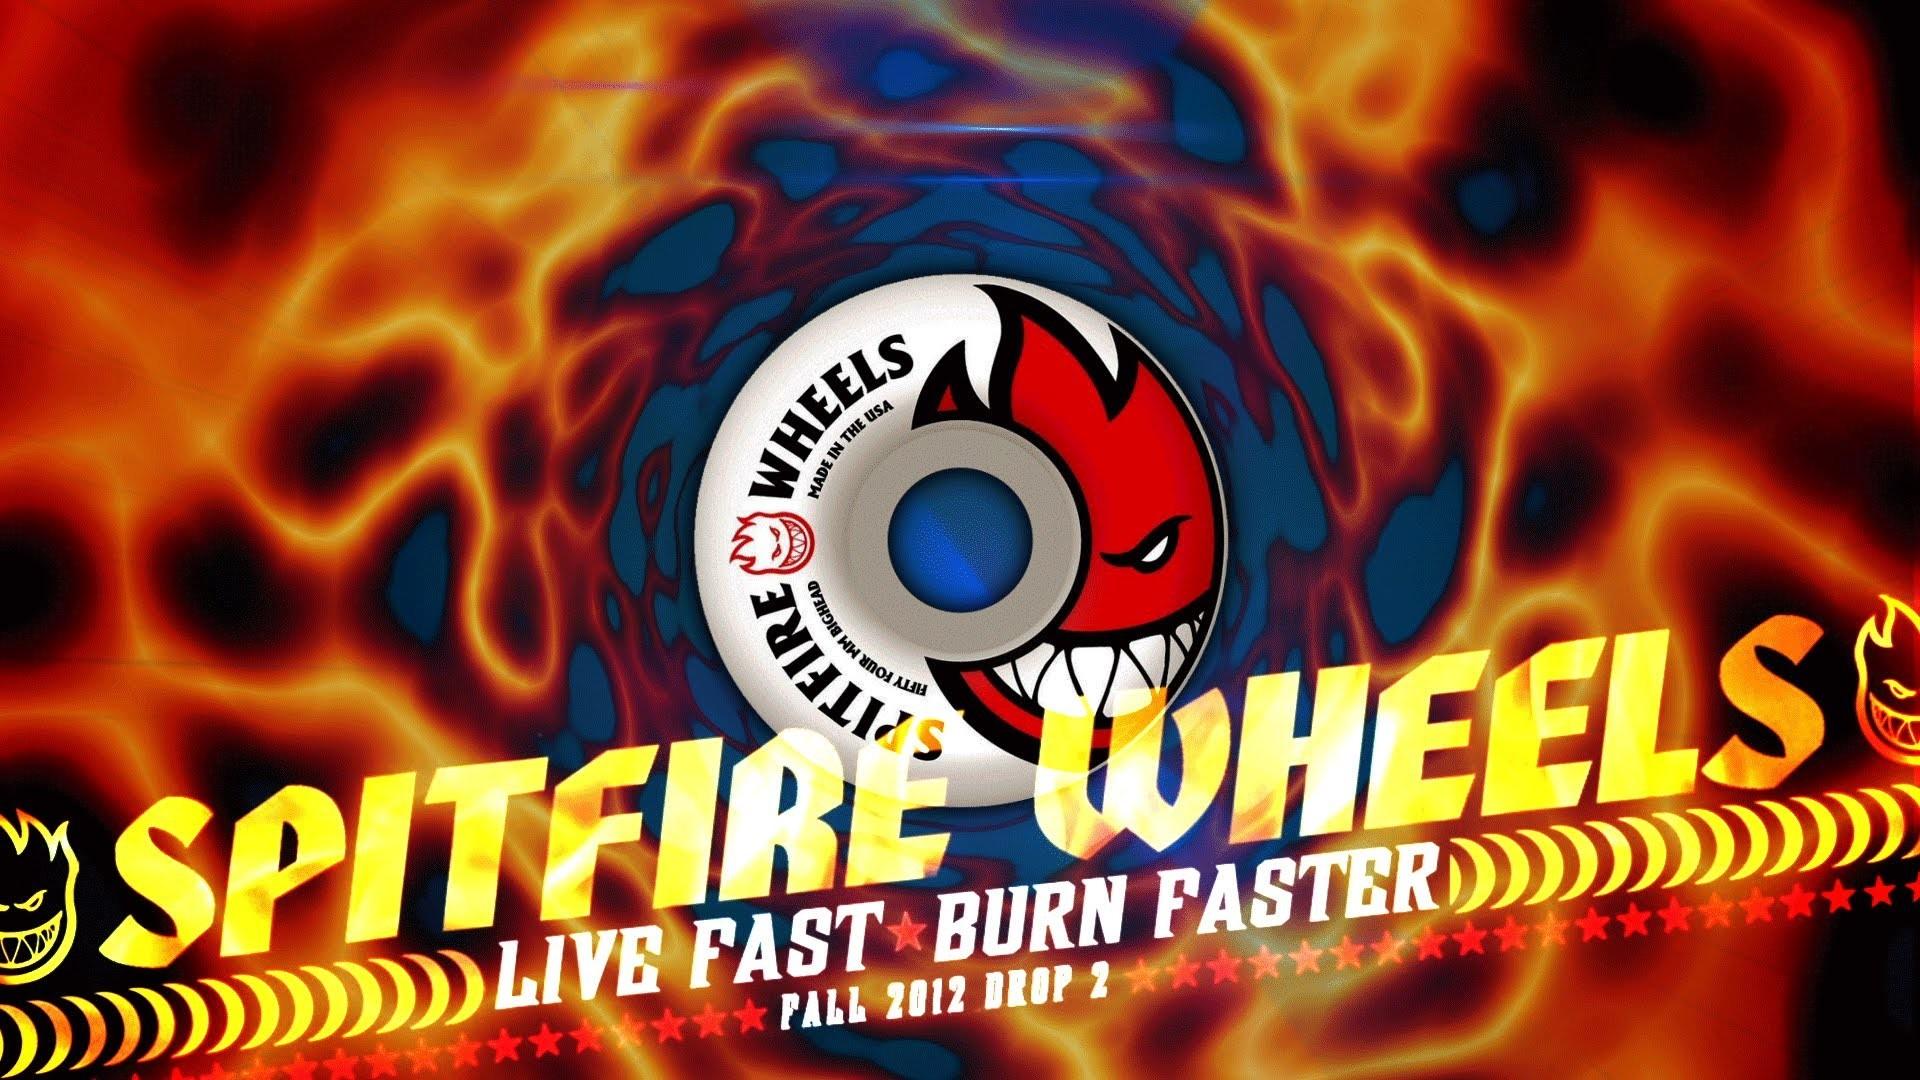 Res: 1920x1080, Spitfire Wheels - Live Fast - Burn Faster